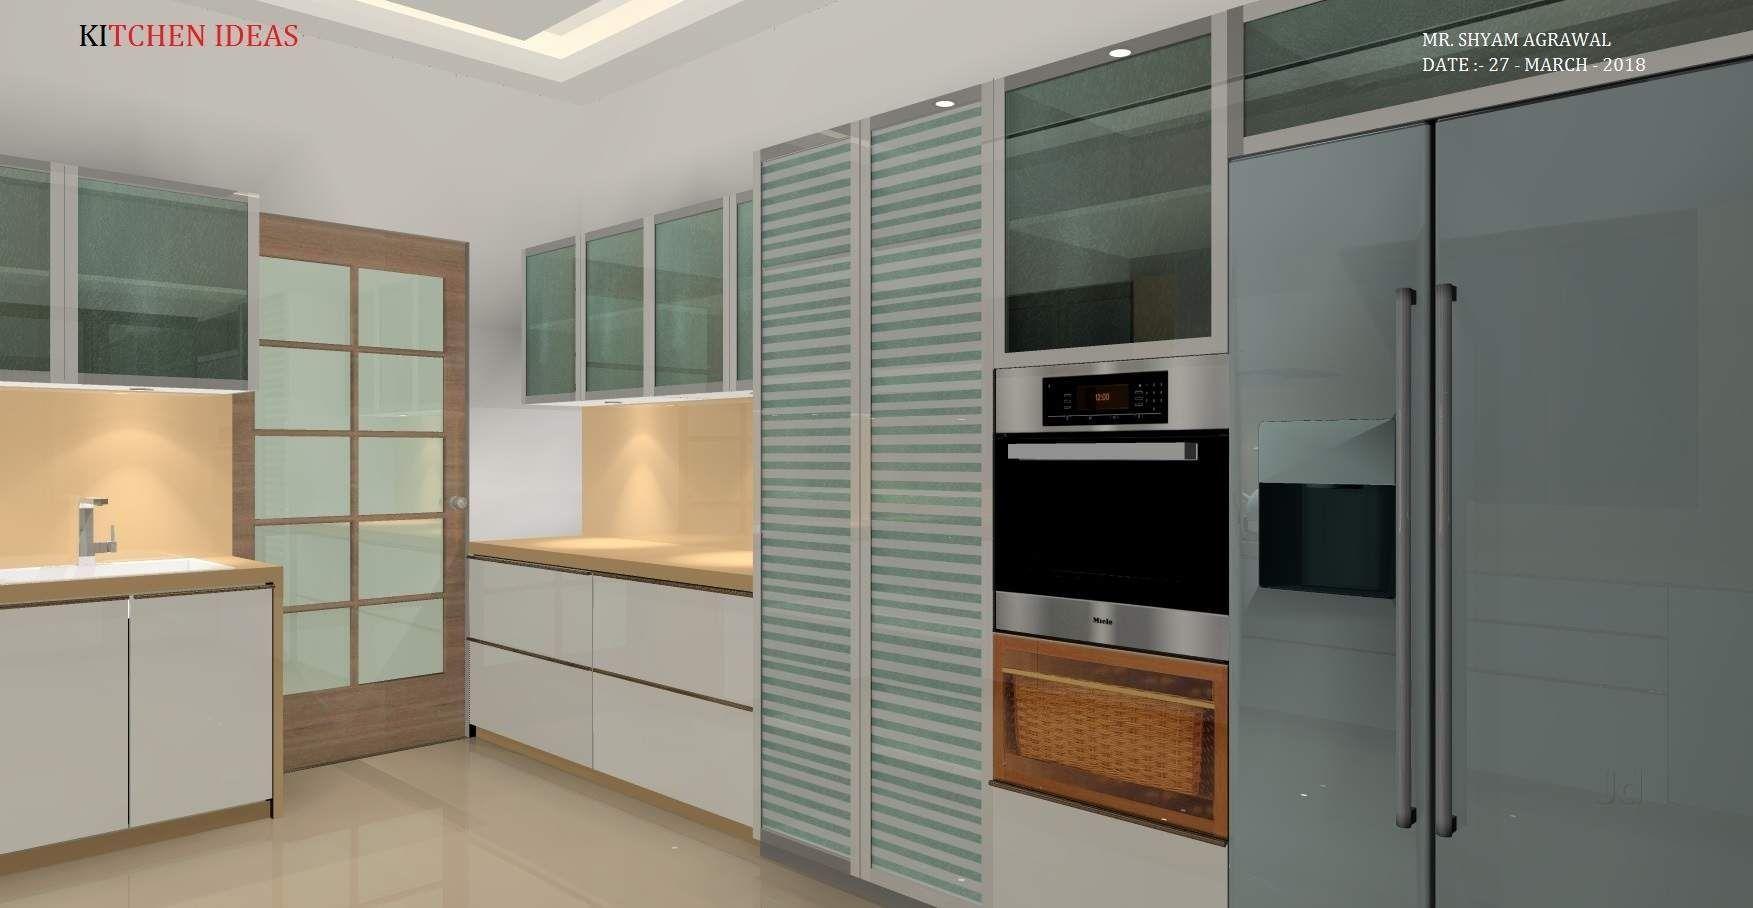 Kitchen Ideas Nagpur In 2021 Kitchen Kitchenideas Nagpur